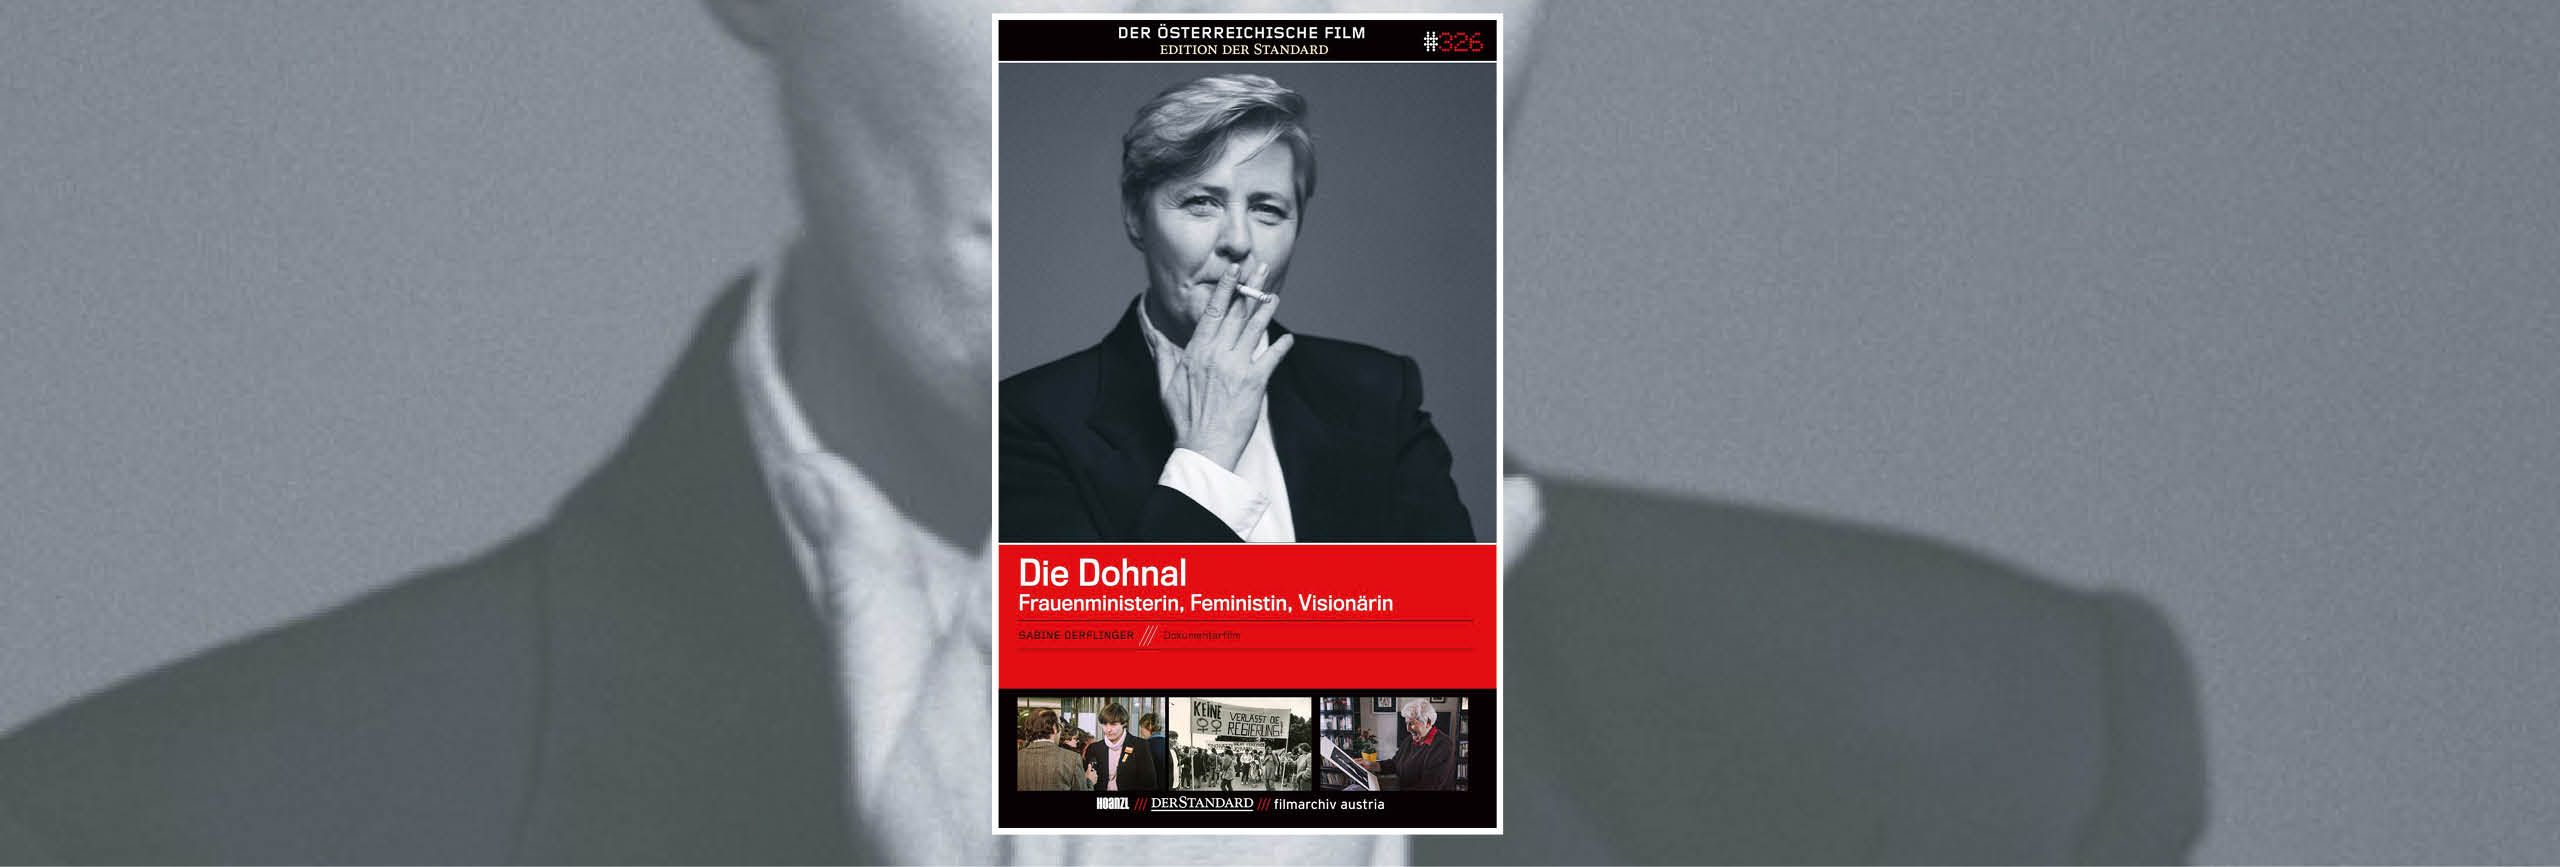 Die Dohnal – Frauenministerin, Feministin, Visionärin